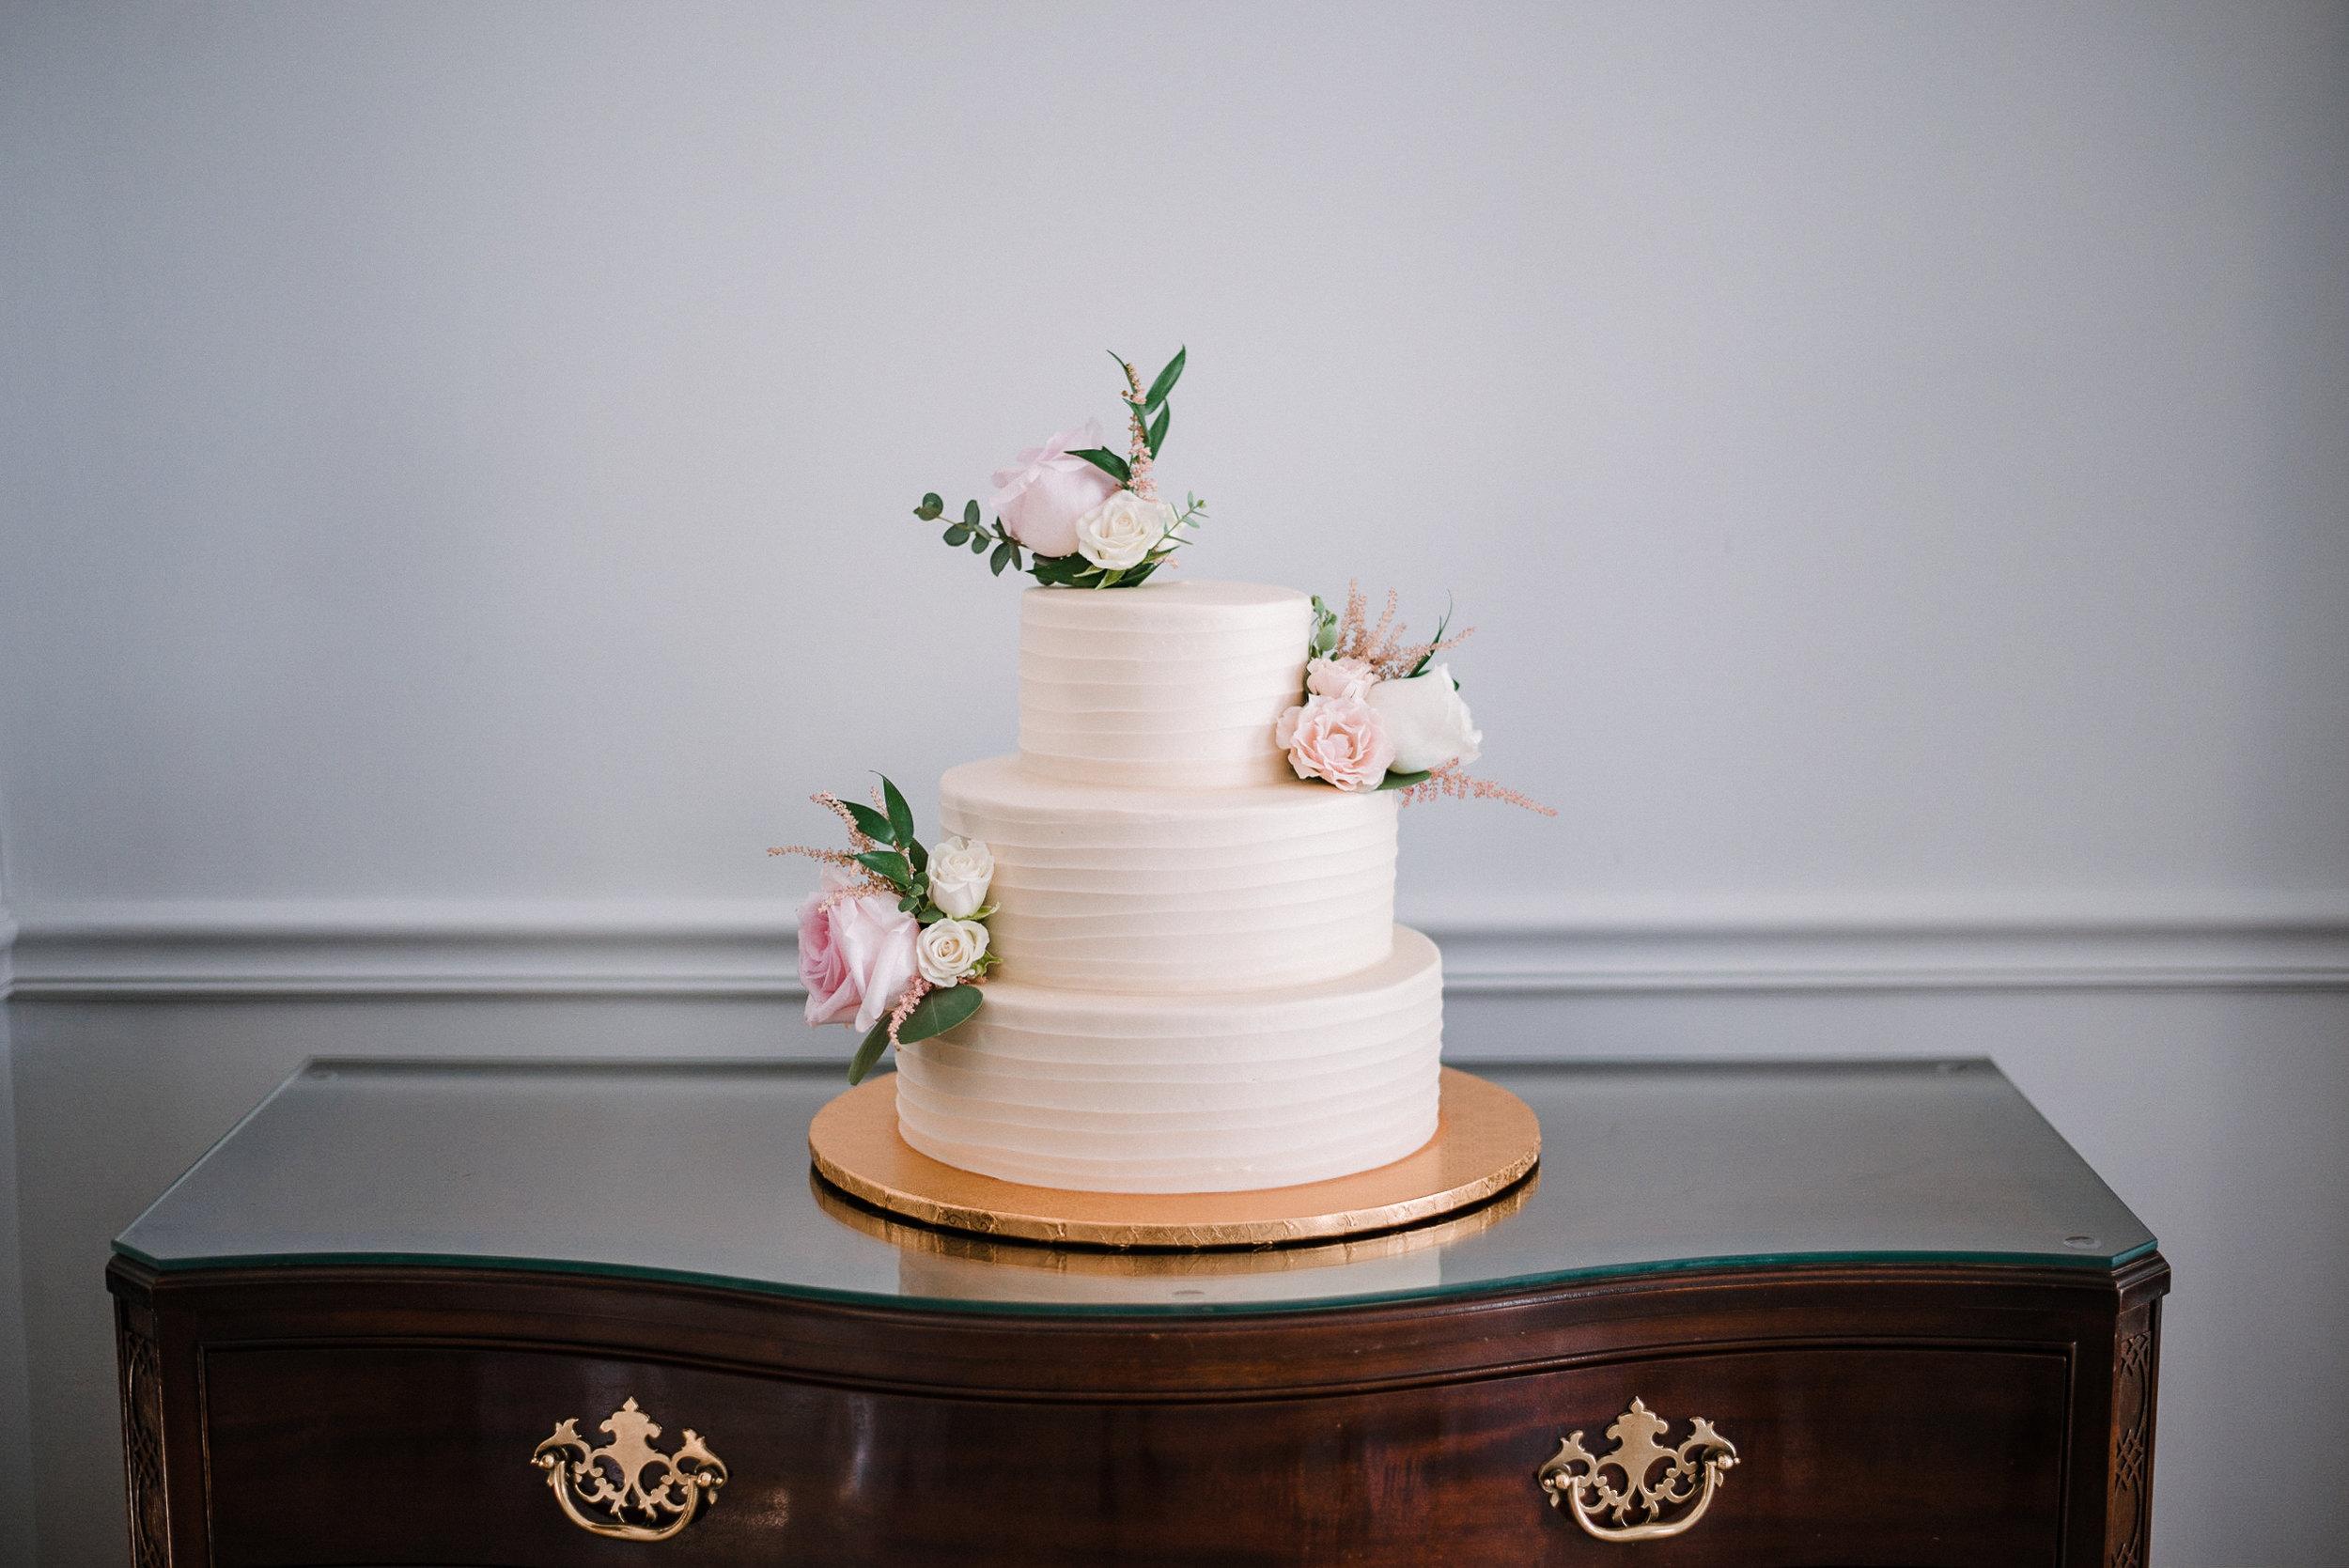 wedding cake detail shot at Birkby House